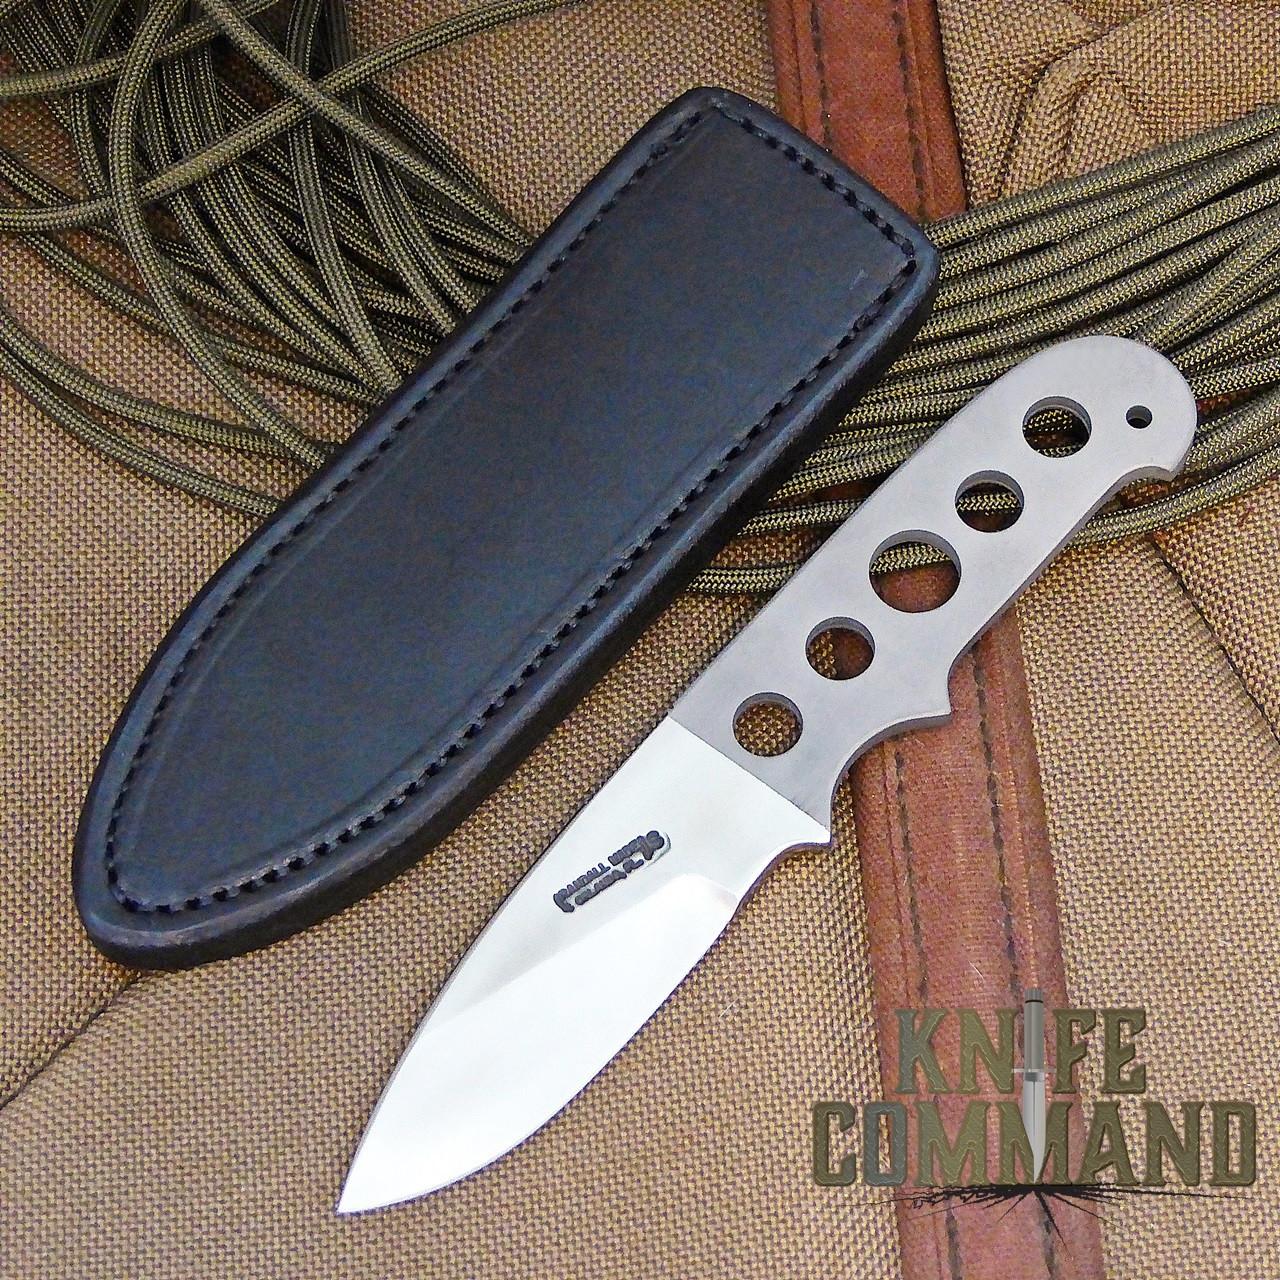 Randall Made Knives Triathlete Knife.  Nice black sheath.